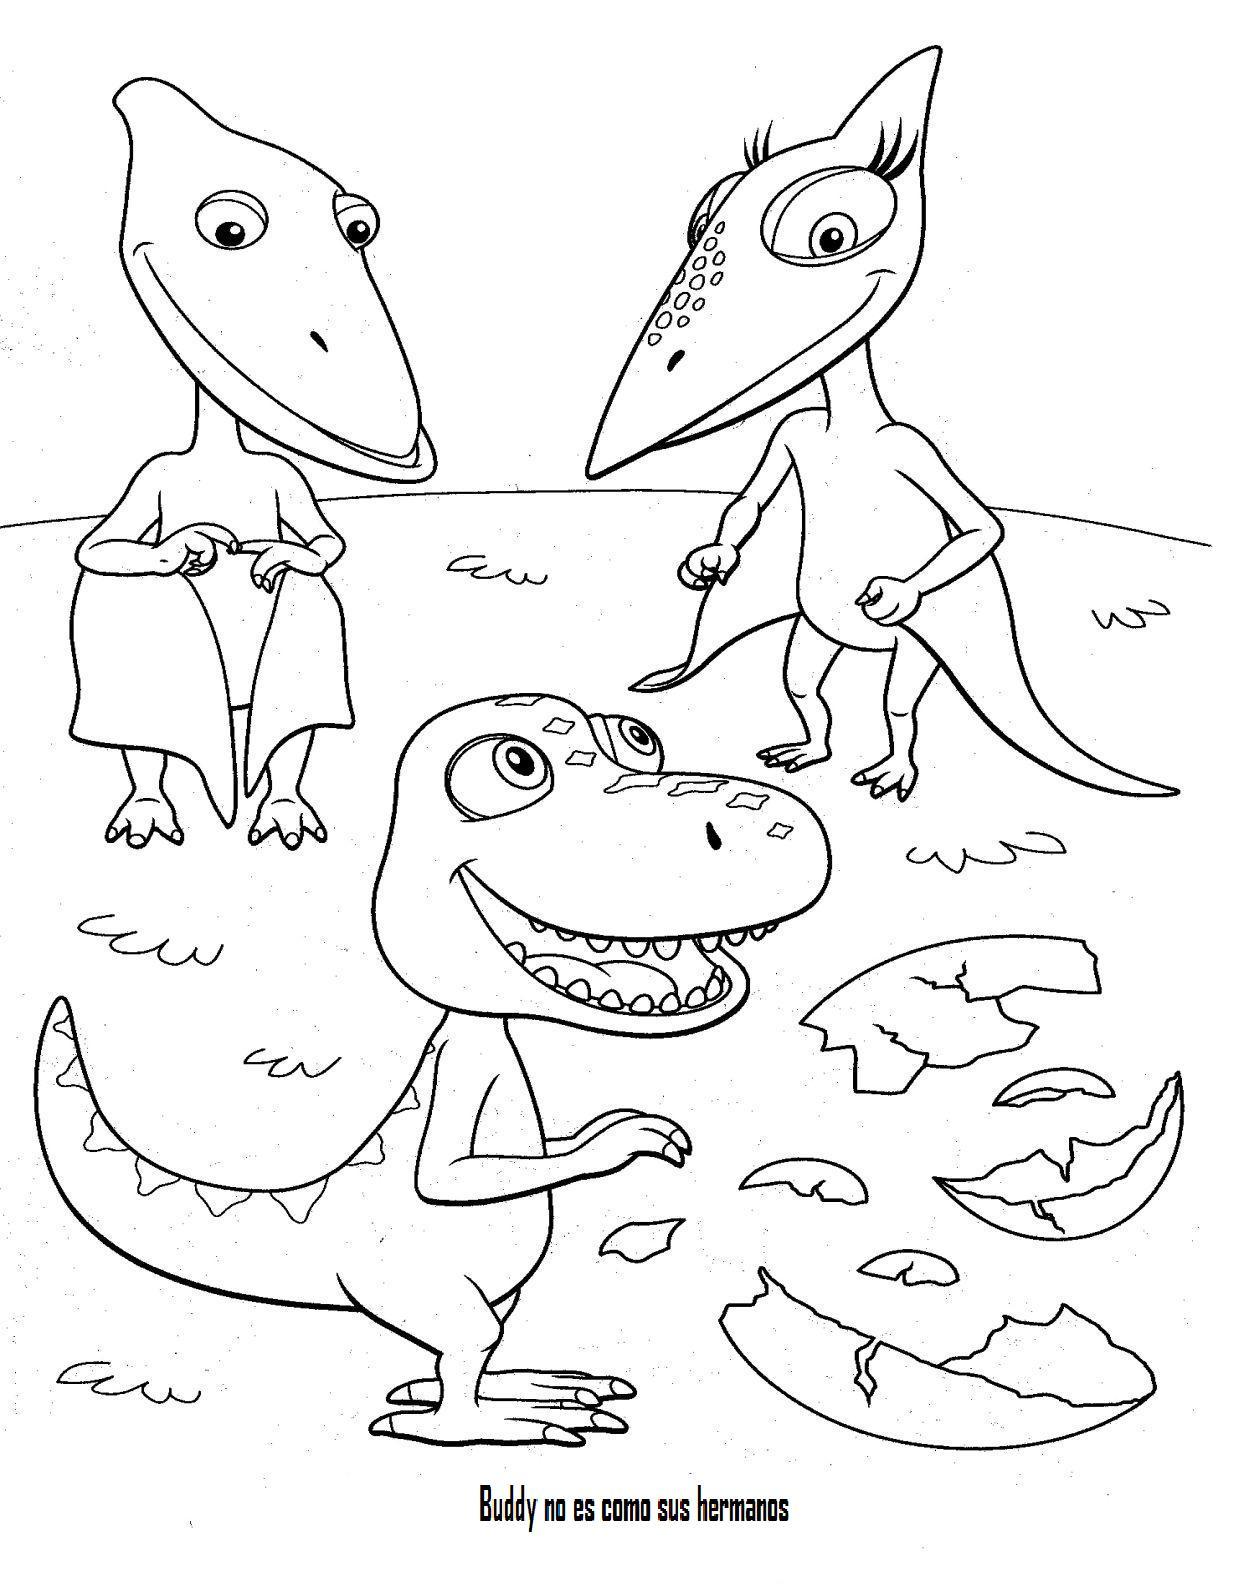 Excepcional Dinosaurios Lindos Para Colorear Imagen - Dibujos Para ...